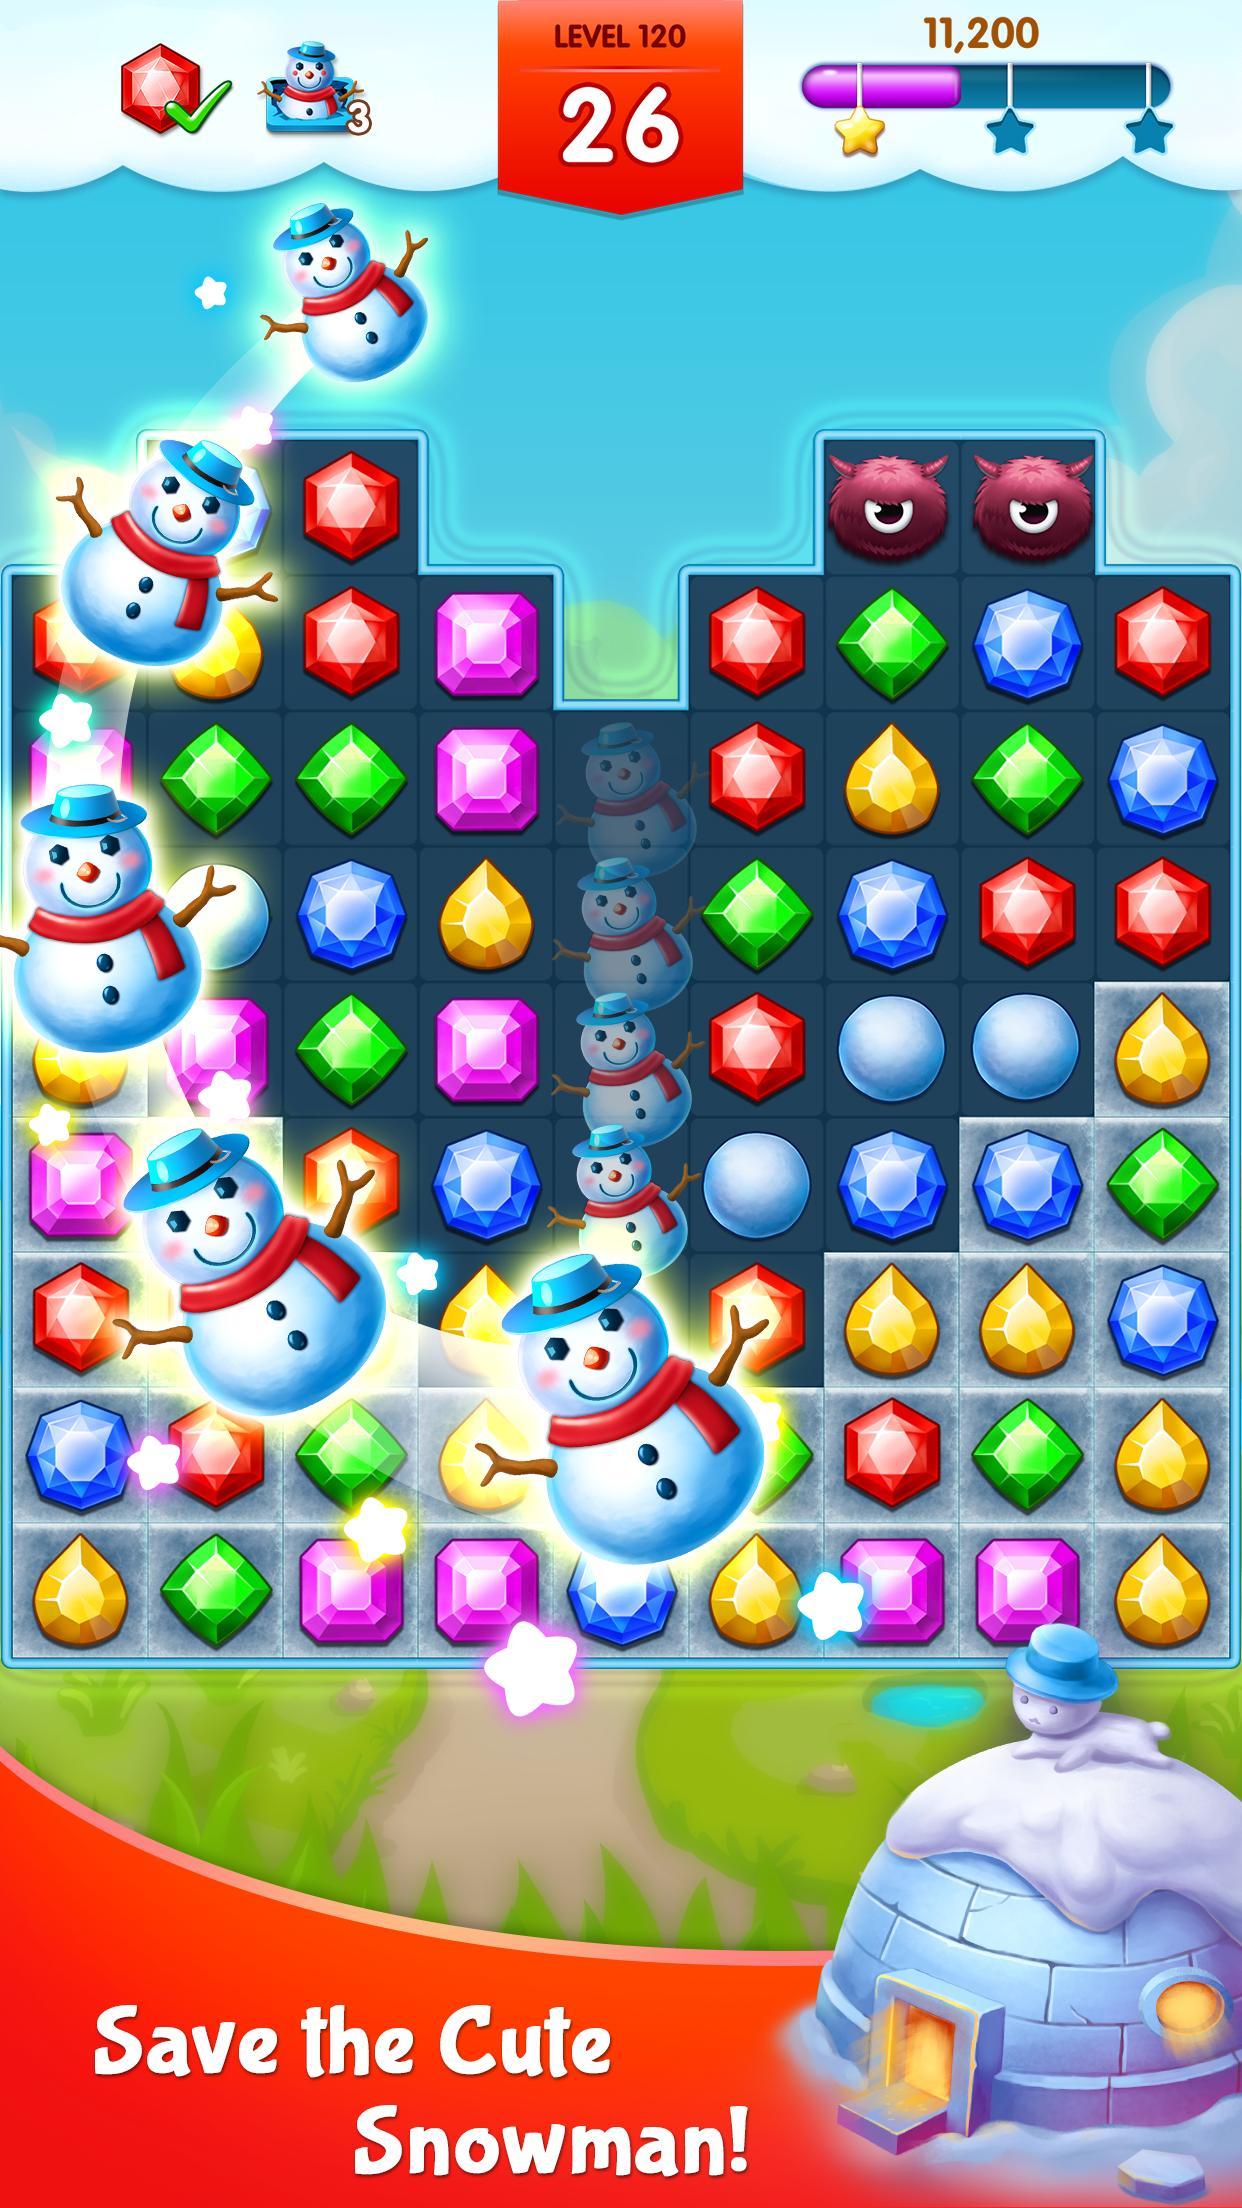 Jewels Legend - Match 3 Puzzle 2.33.3 Screenshot 15